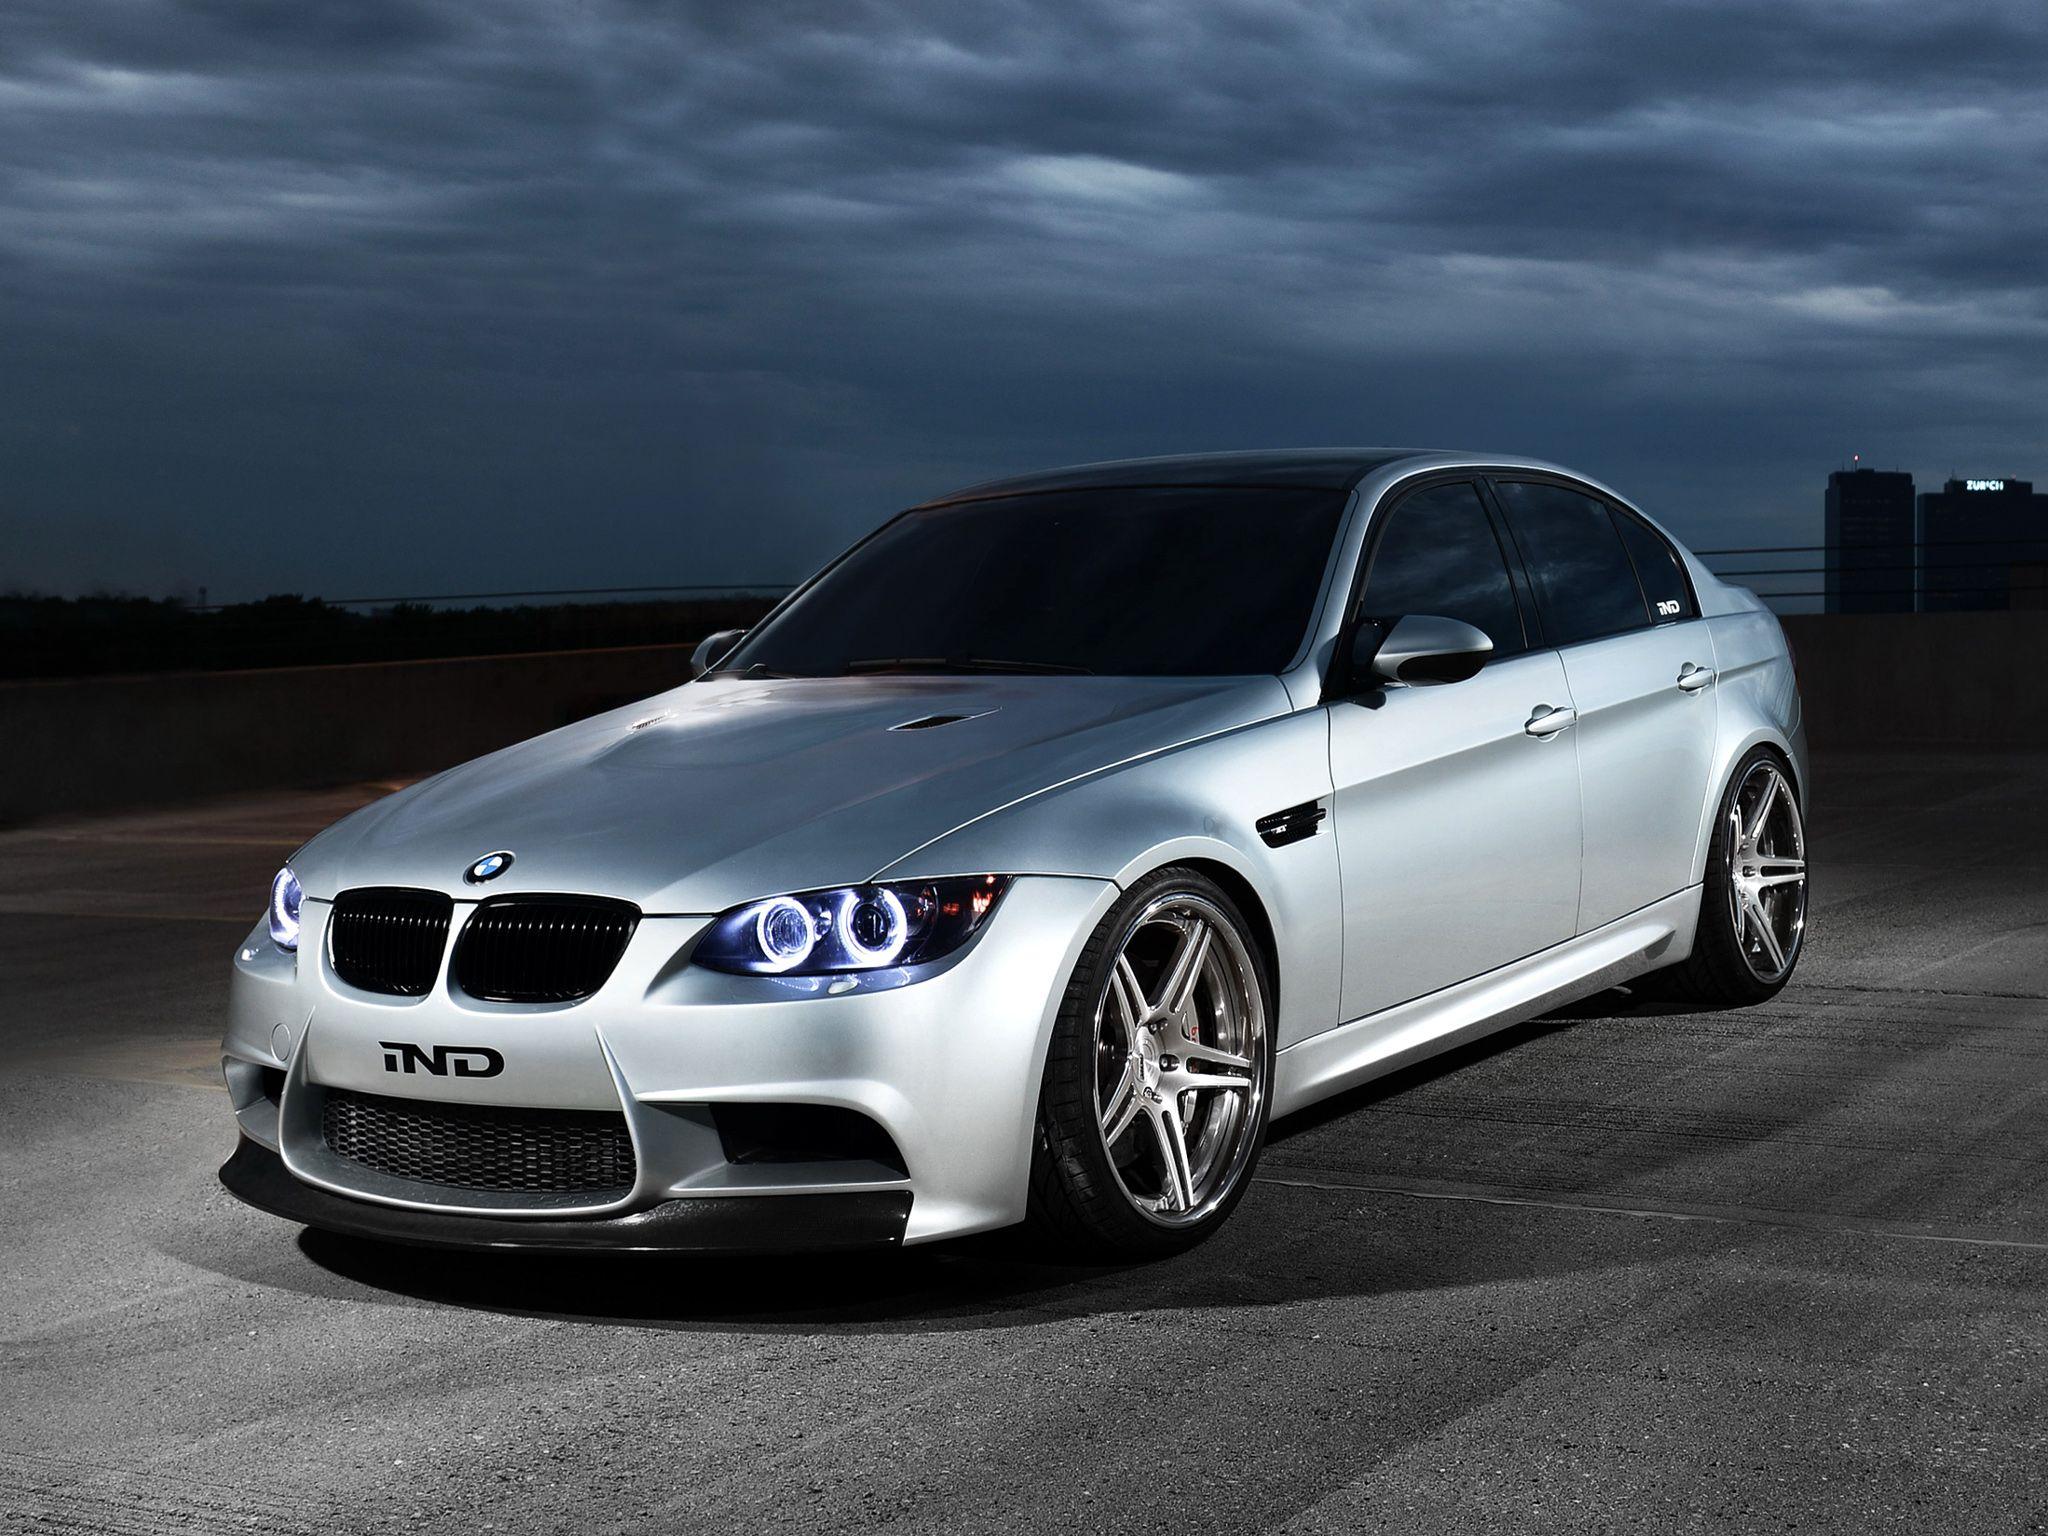 Used 2007 BMW Z4 3.0si For Sale | Costa Mesa CA | CAR / TRUCK - Z4 ...